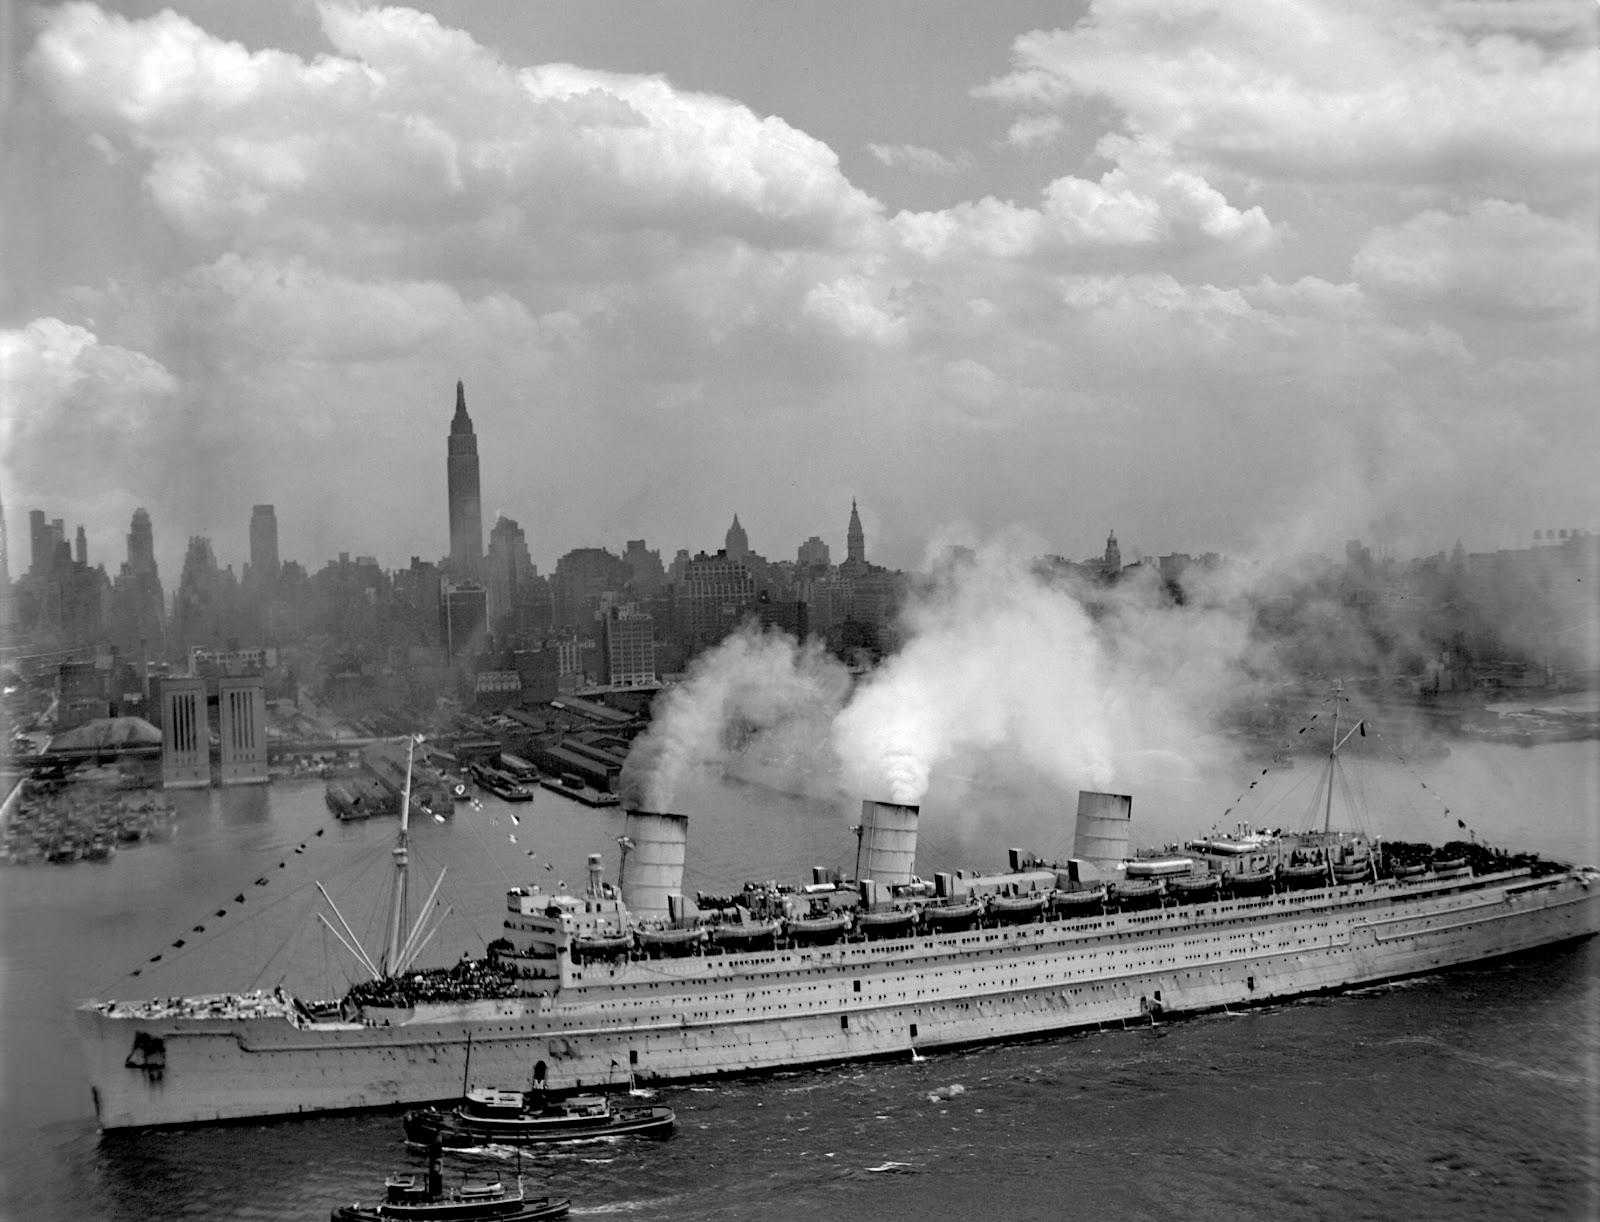 «Queen Mary» το 1945 στη Νέα Υόρκη - e-Nautilia.gr | Το Ελληνικό Portal για την Ναυτιλία. Τελευταία νέα, άρθρα, Οπτικοακουστικό Υλικό